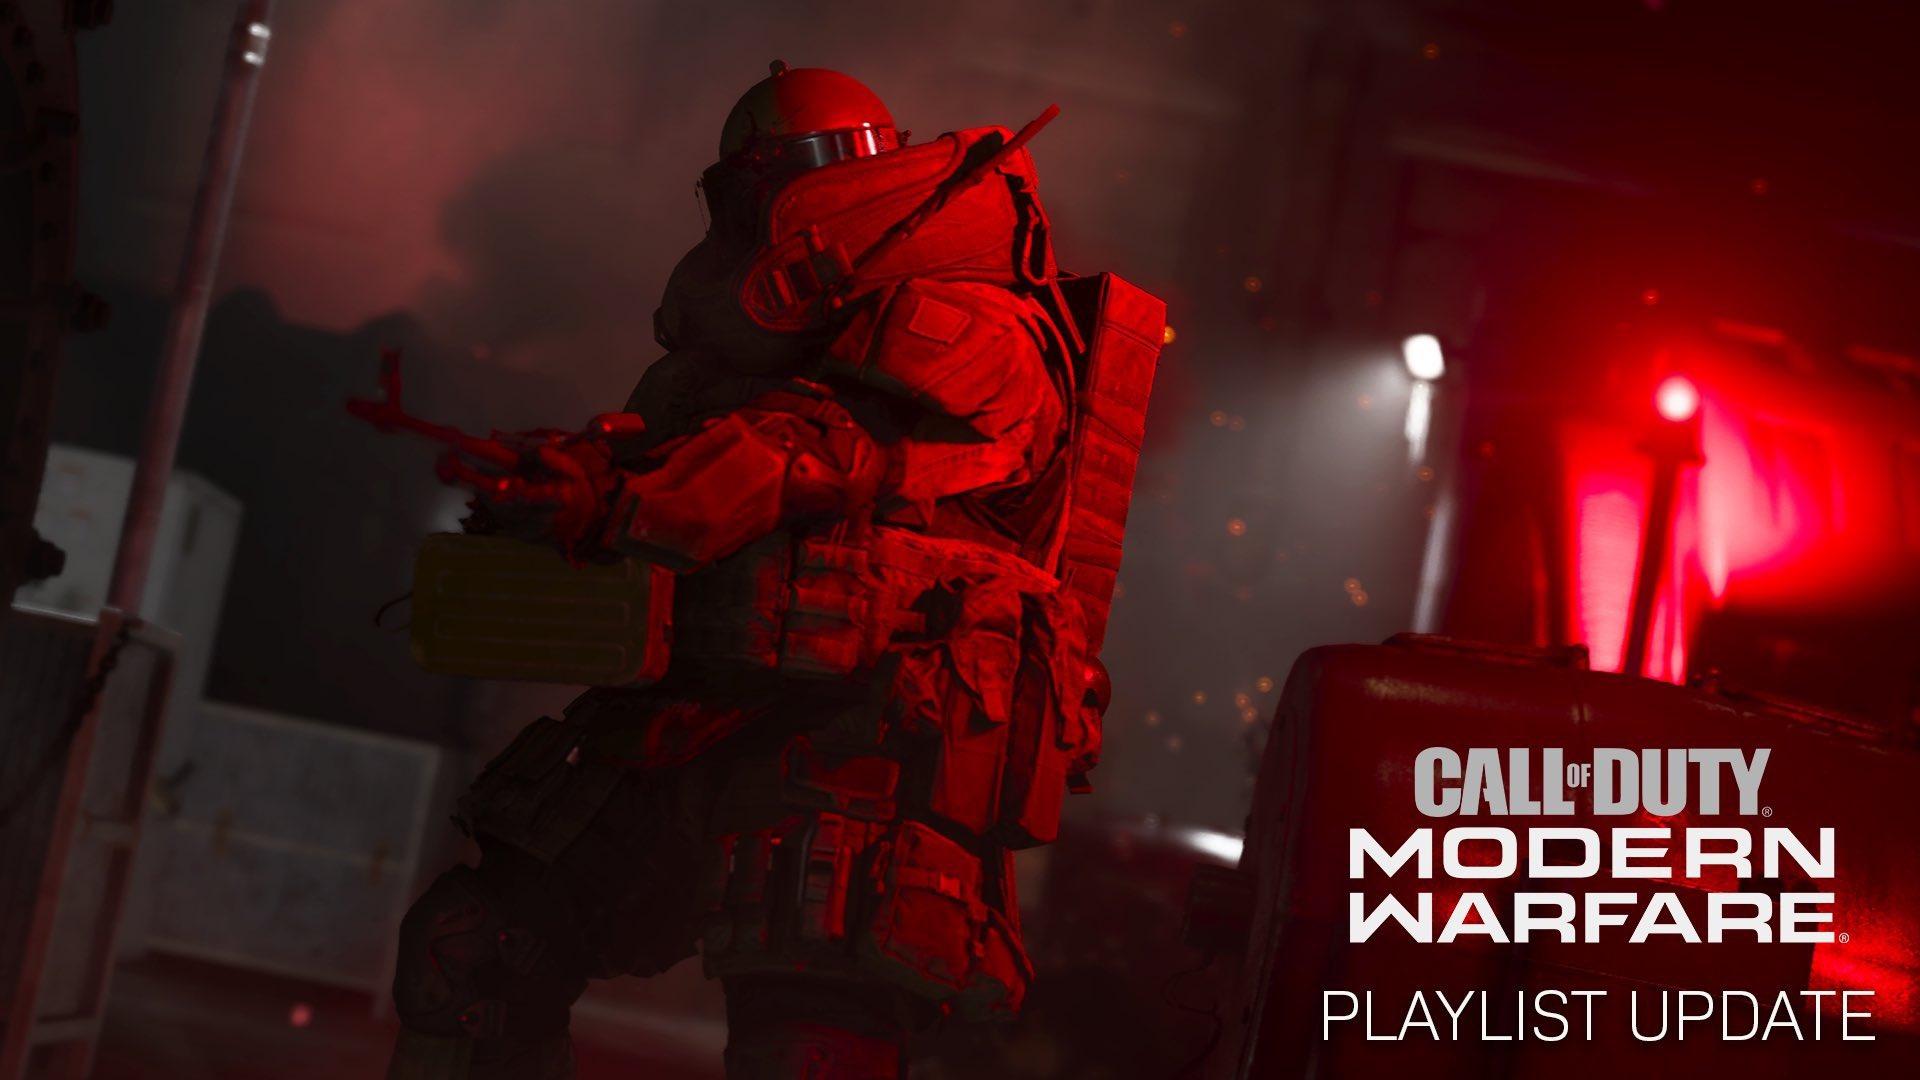 Warzone Juggernaut Trios Tips For Killing The Juggernaut And Winning The New Royale Mode Gamesradar